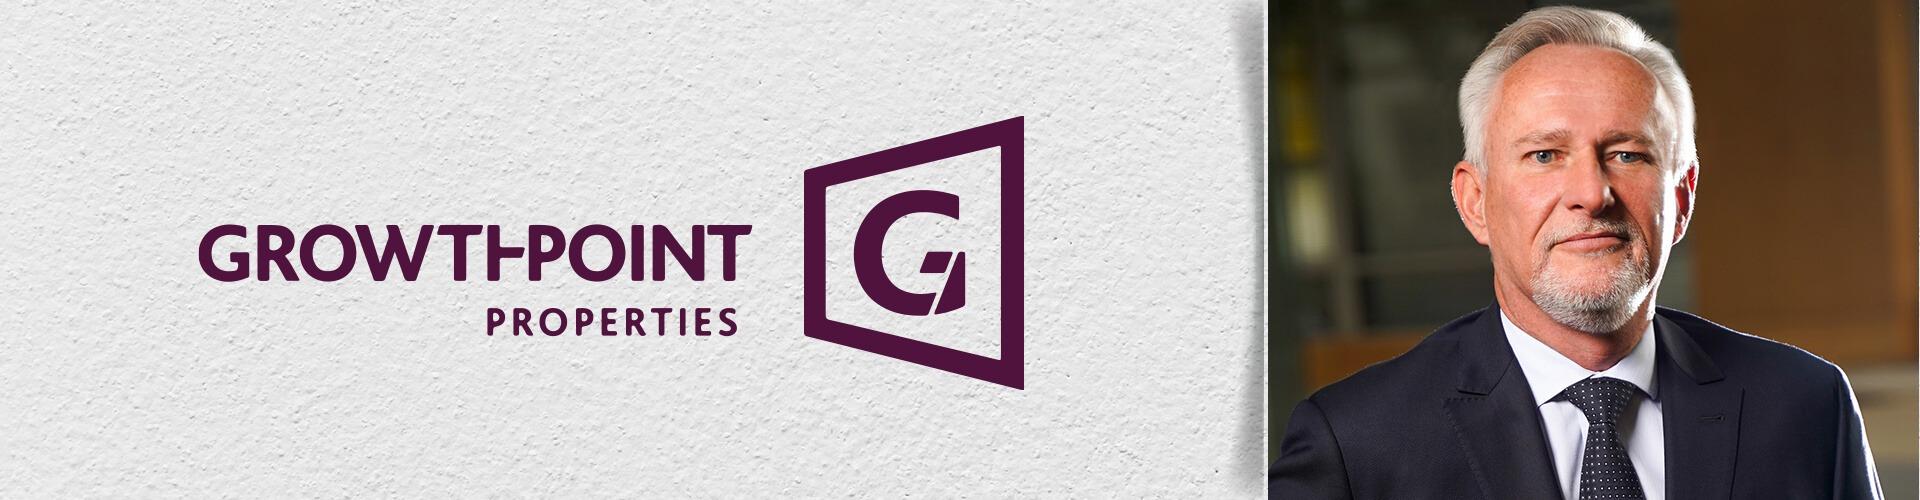 SAREIT Growthpoint header